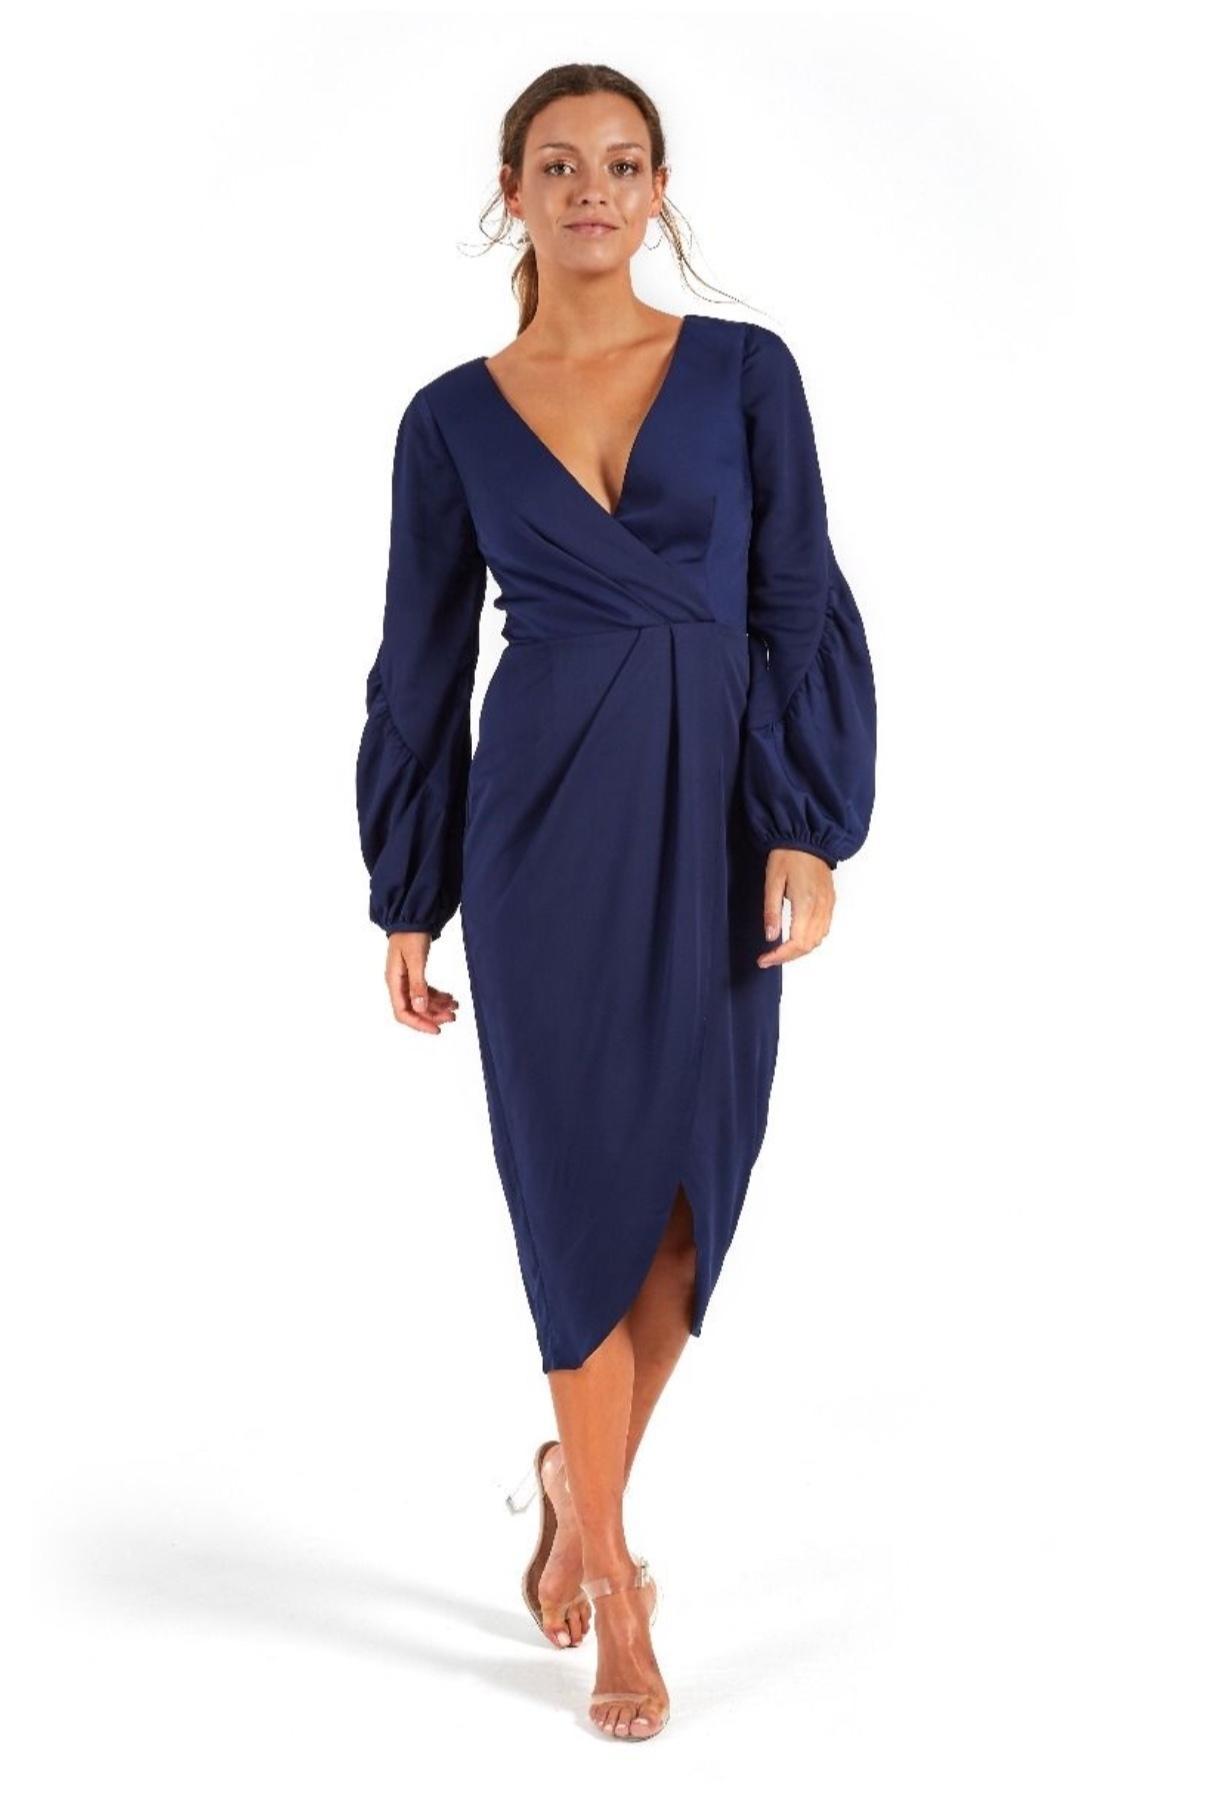 673bb673161 COOPER ST  Florence Long Sleeve Drape Dress  Navy Size 16